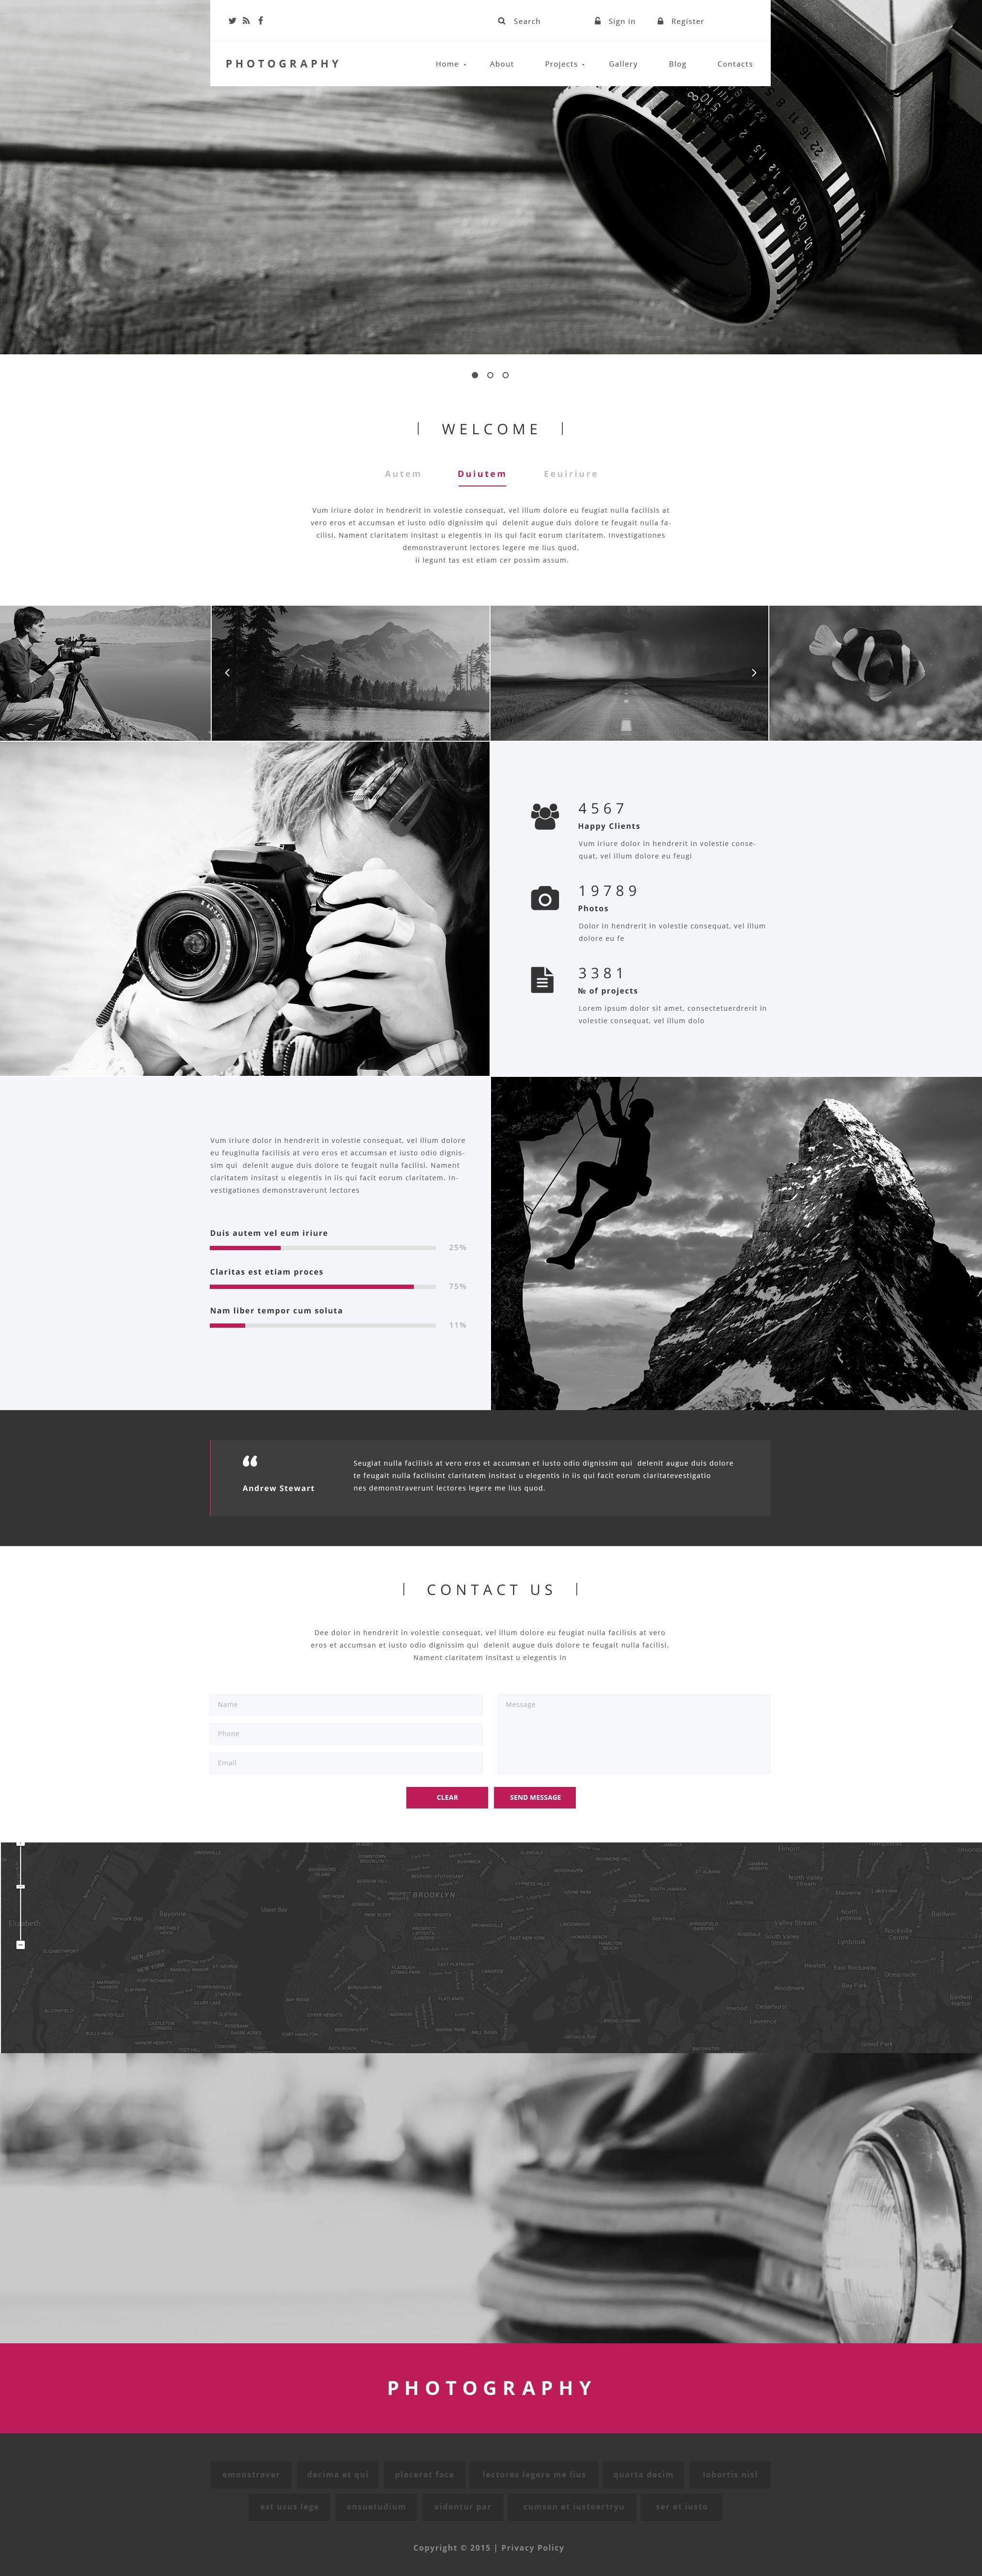 Photography Template Drupal №55089 - screenshot